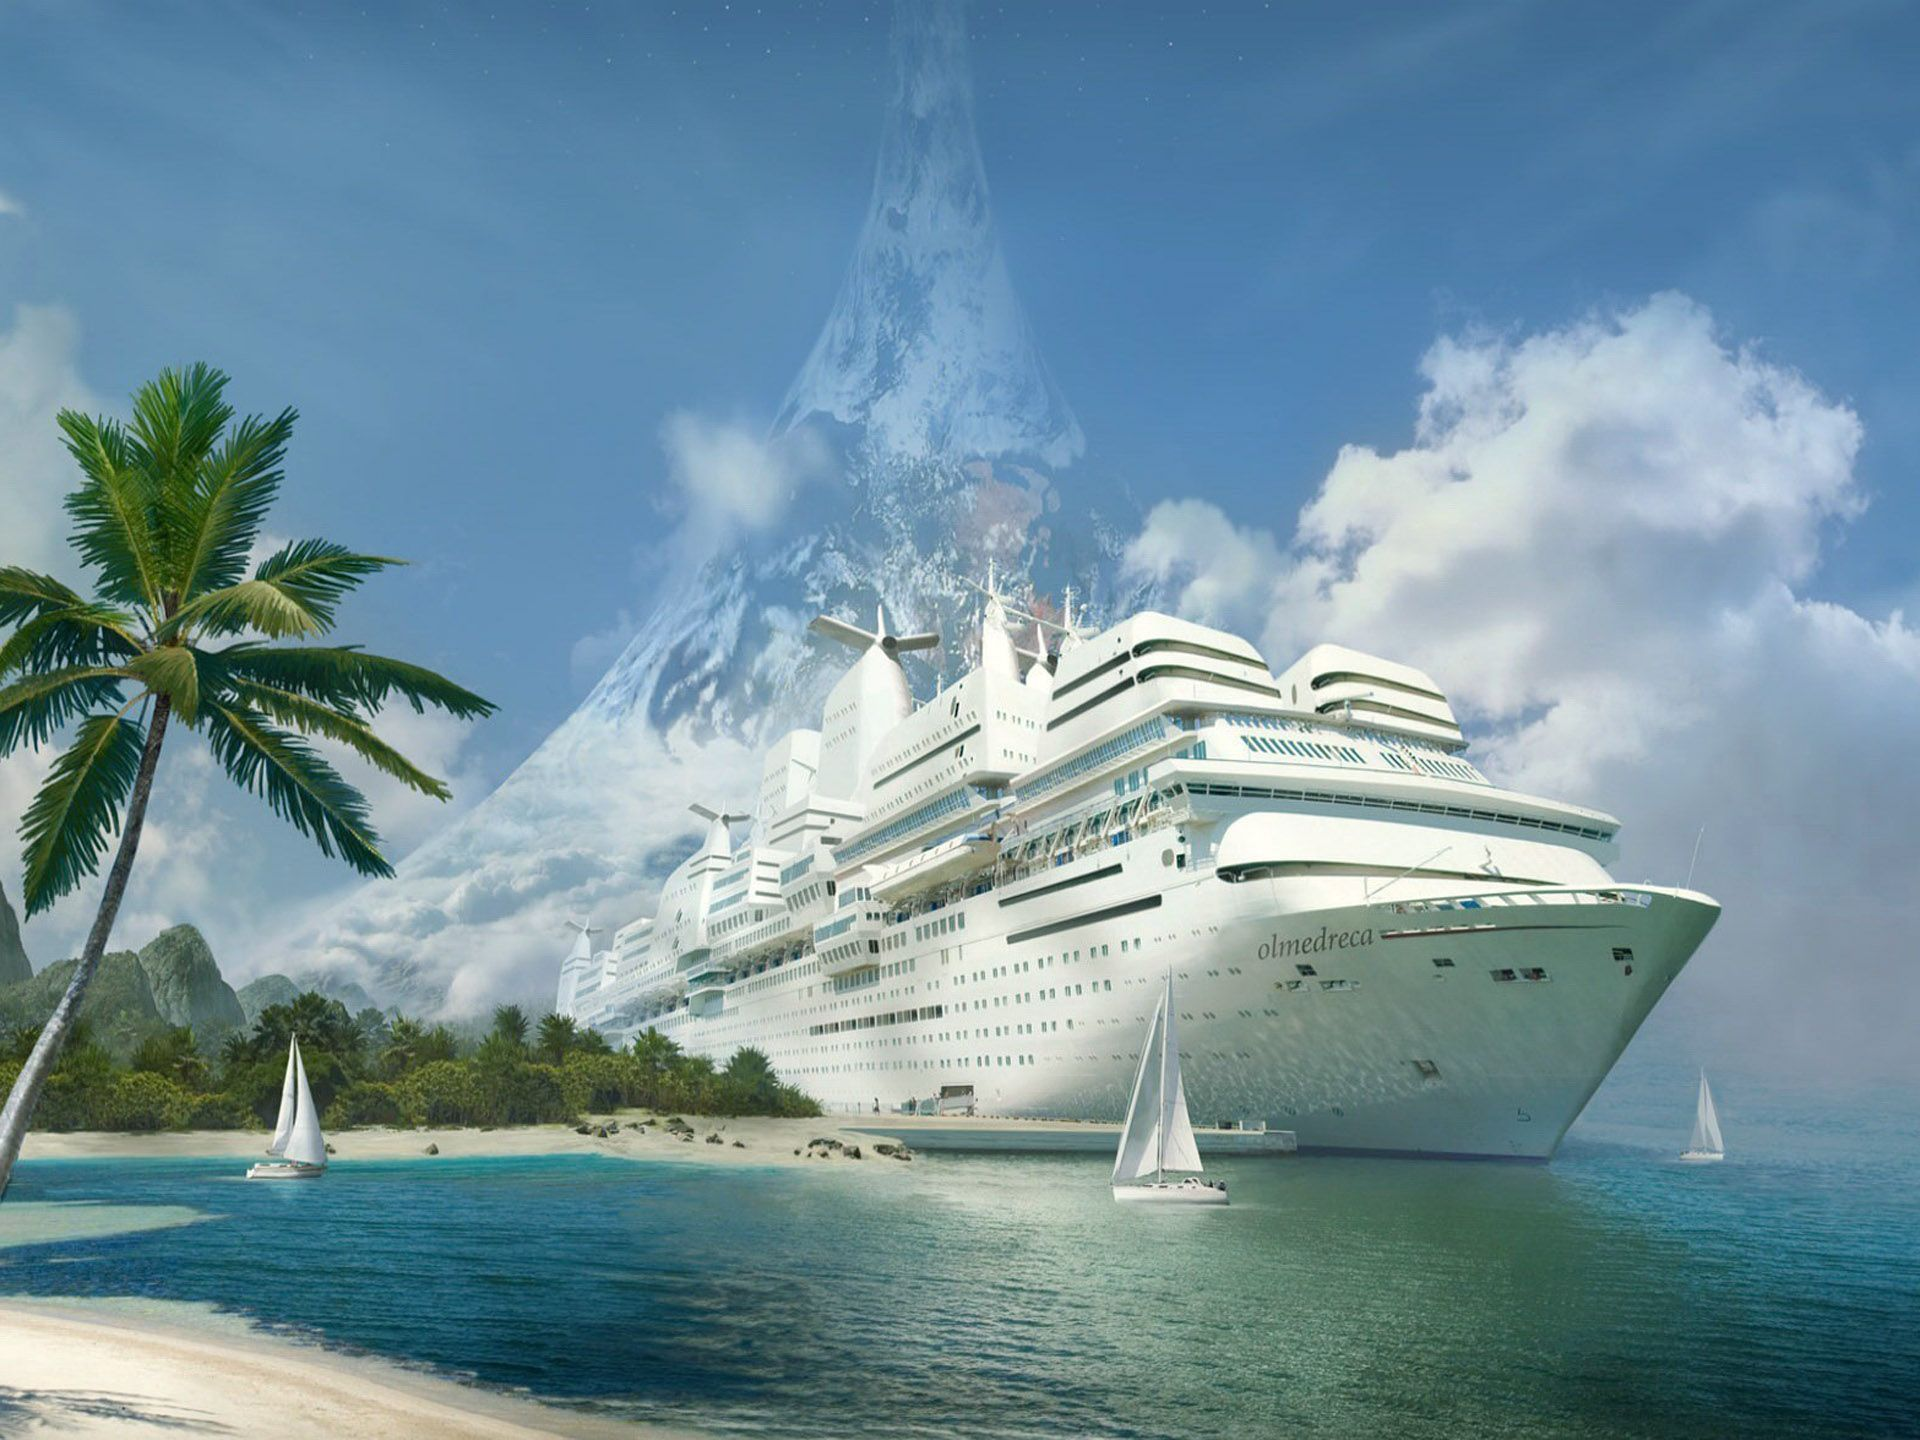 Azamara Cruises 2014 Carnival Cruise Ships Best Cruise Cruise Ship